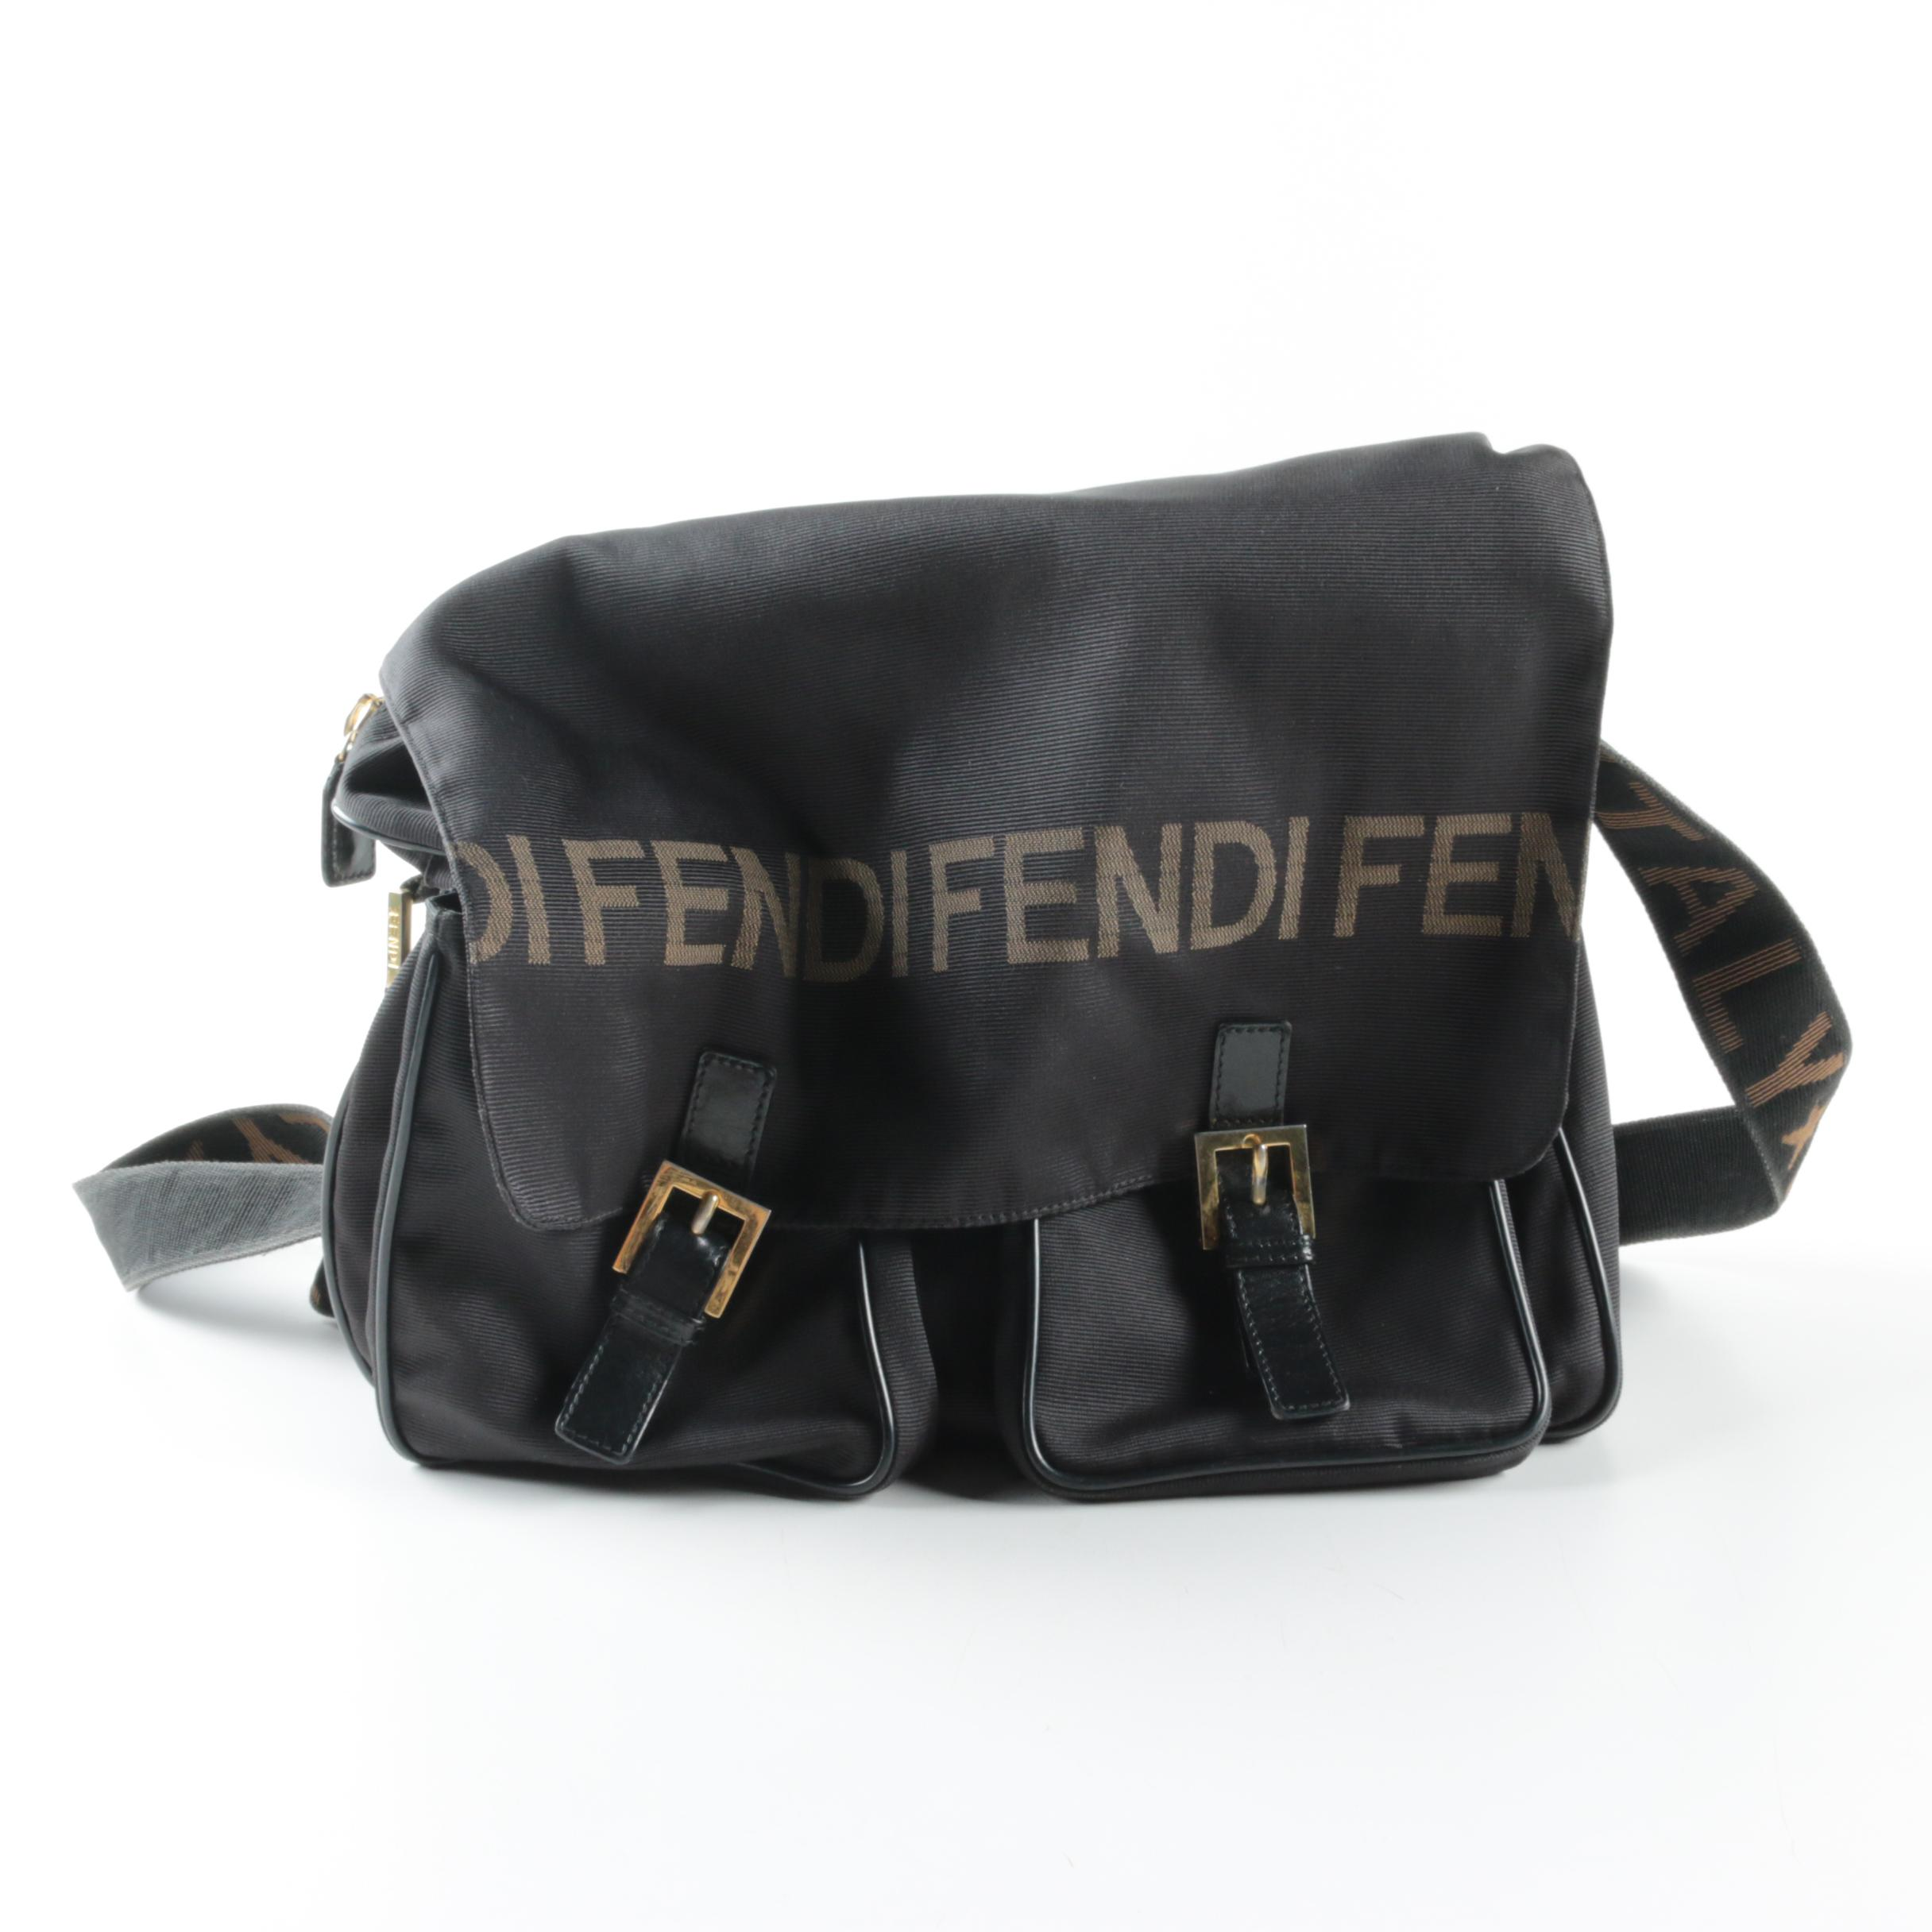 45a69be9ec93 ... best price fendi nylon messenger bag 3f1e9 3b543 ...